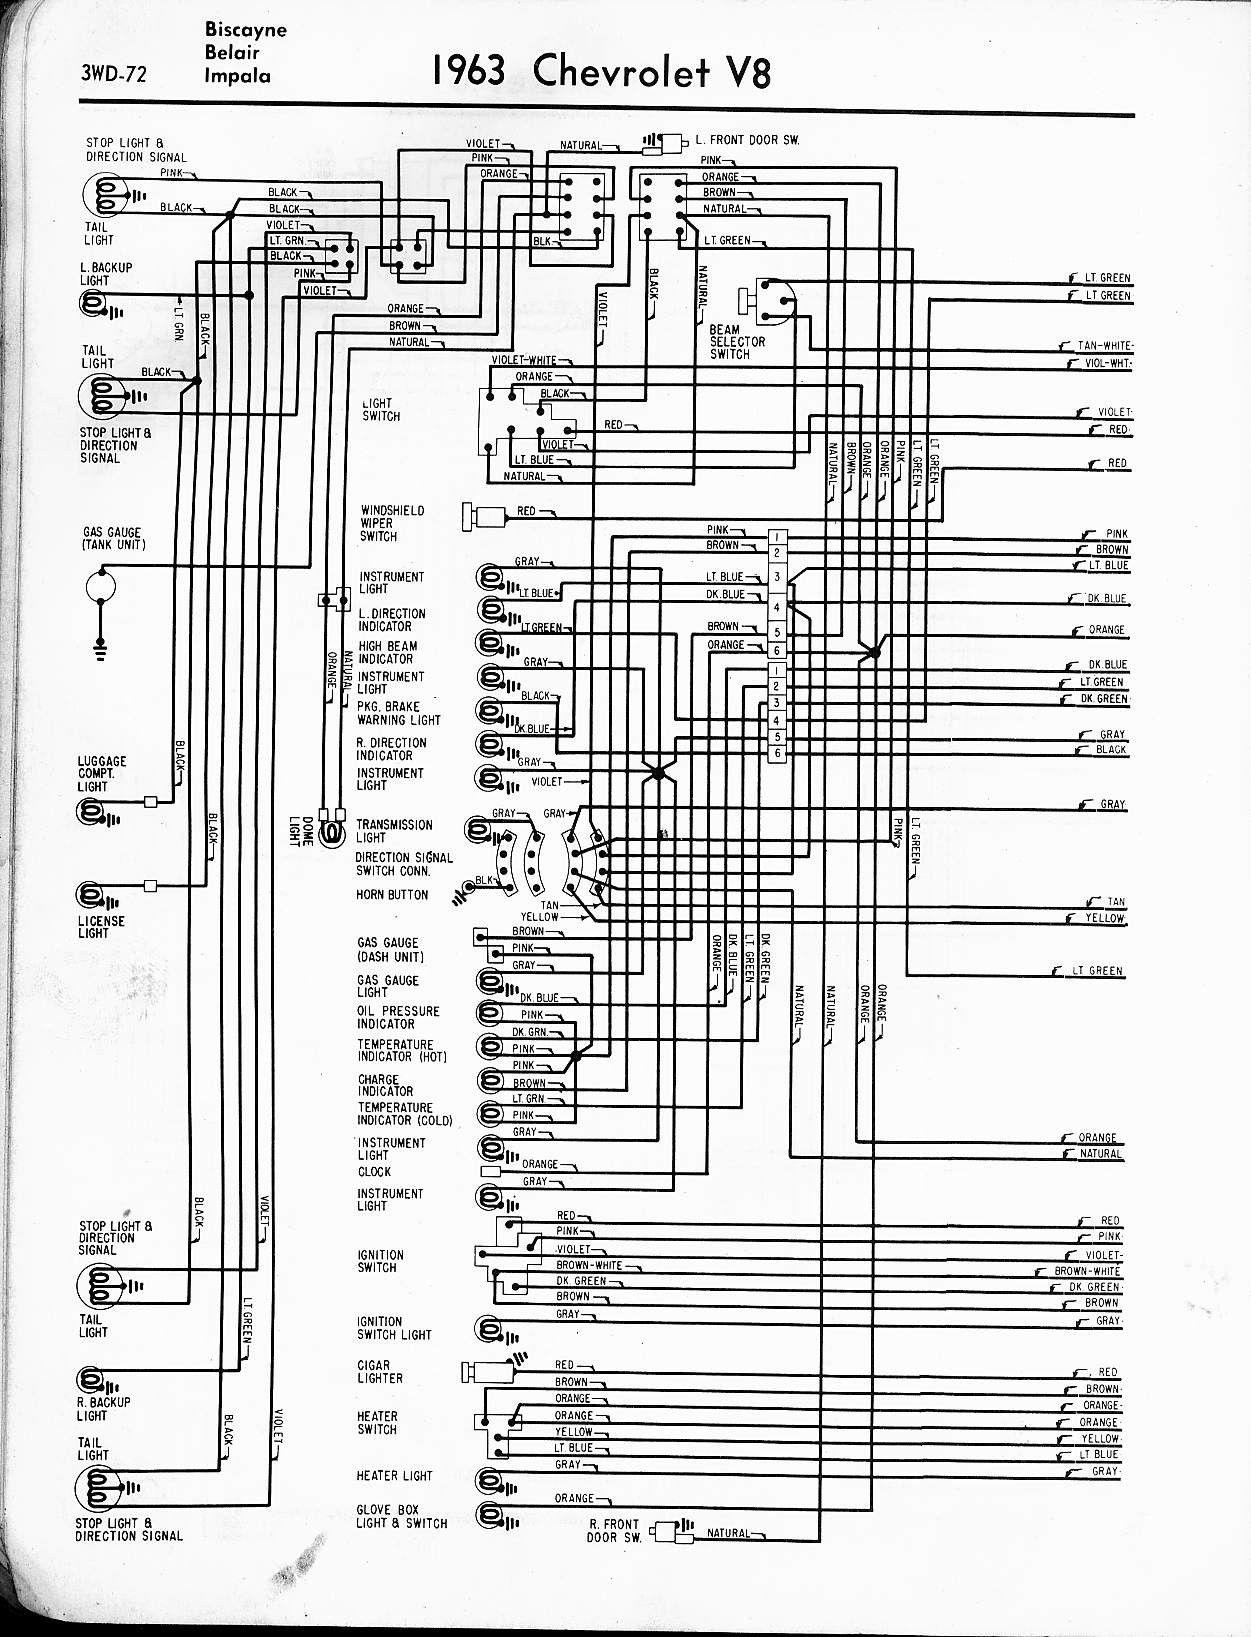 63 Chevy Impala Wiring Diagram | Wiring Diagrams Switch flu | Spi Tronic Wiring Diagram Lexus V8 |  | wiring diagram library